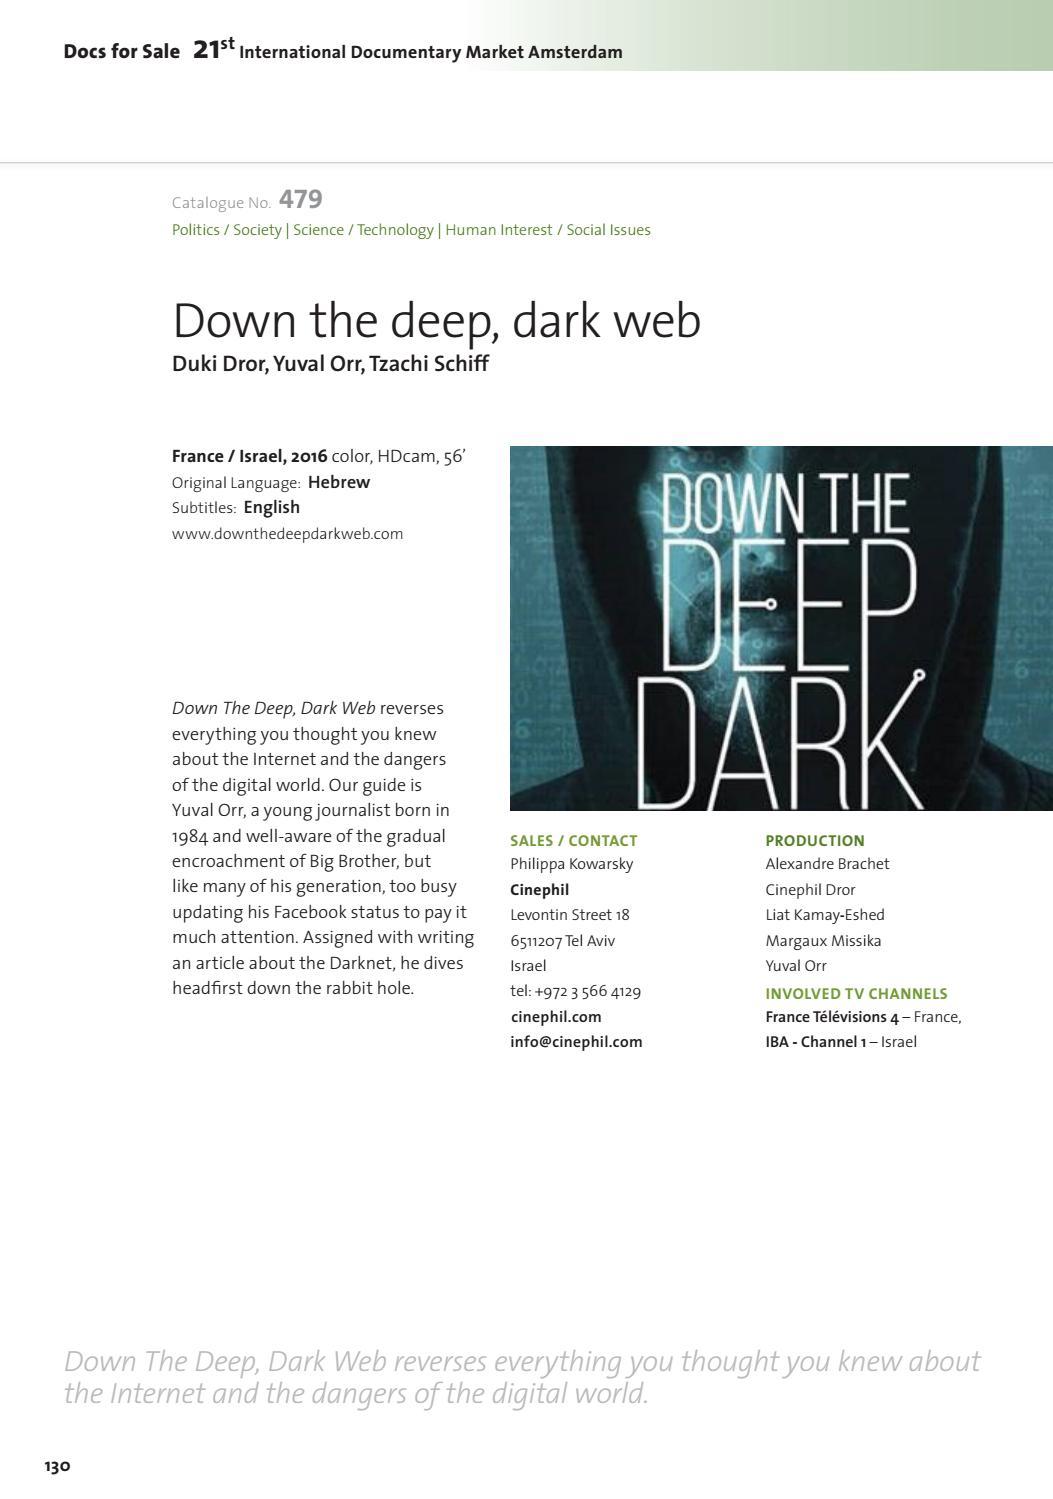 down the deep dark web